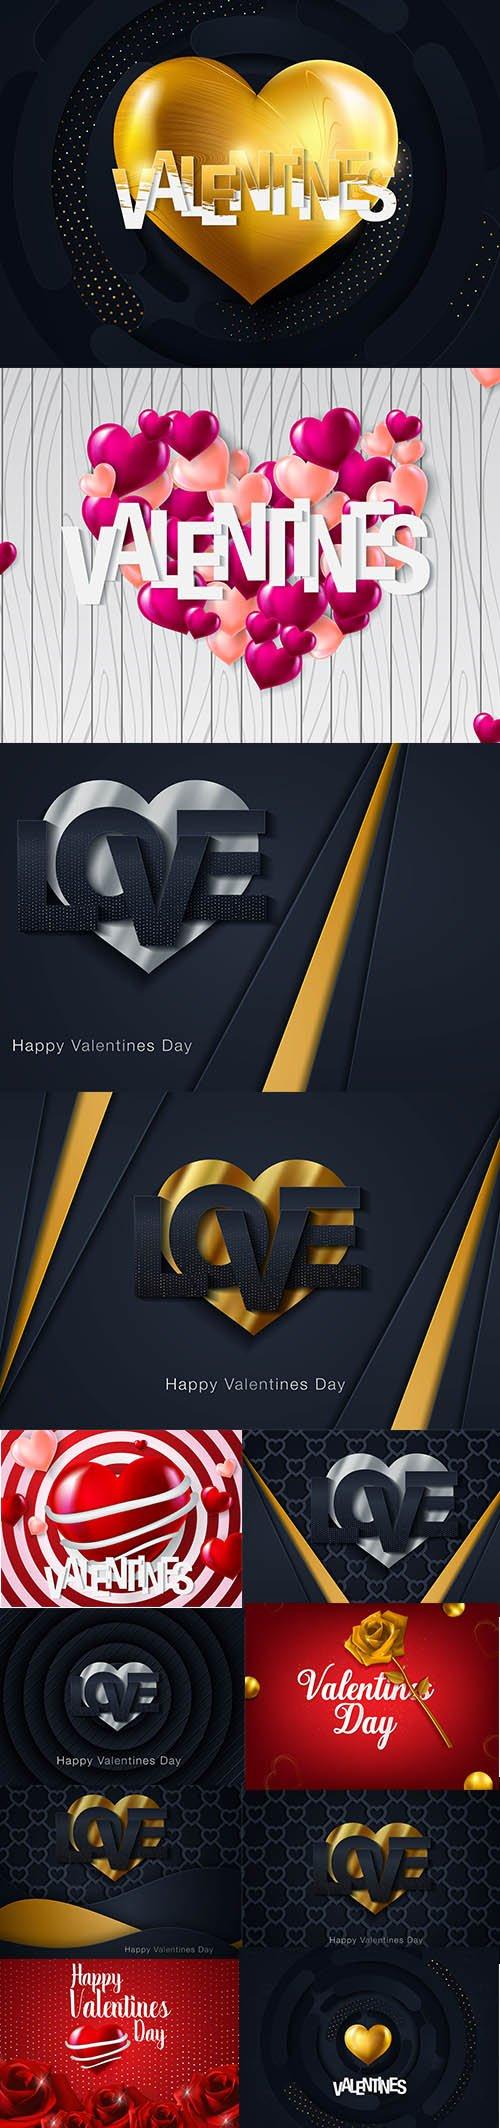 Set of Romantic Valentines Day Illustrations Vol 12